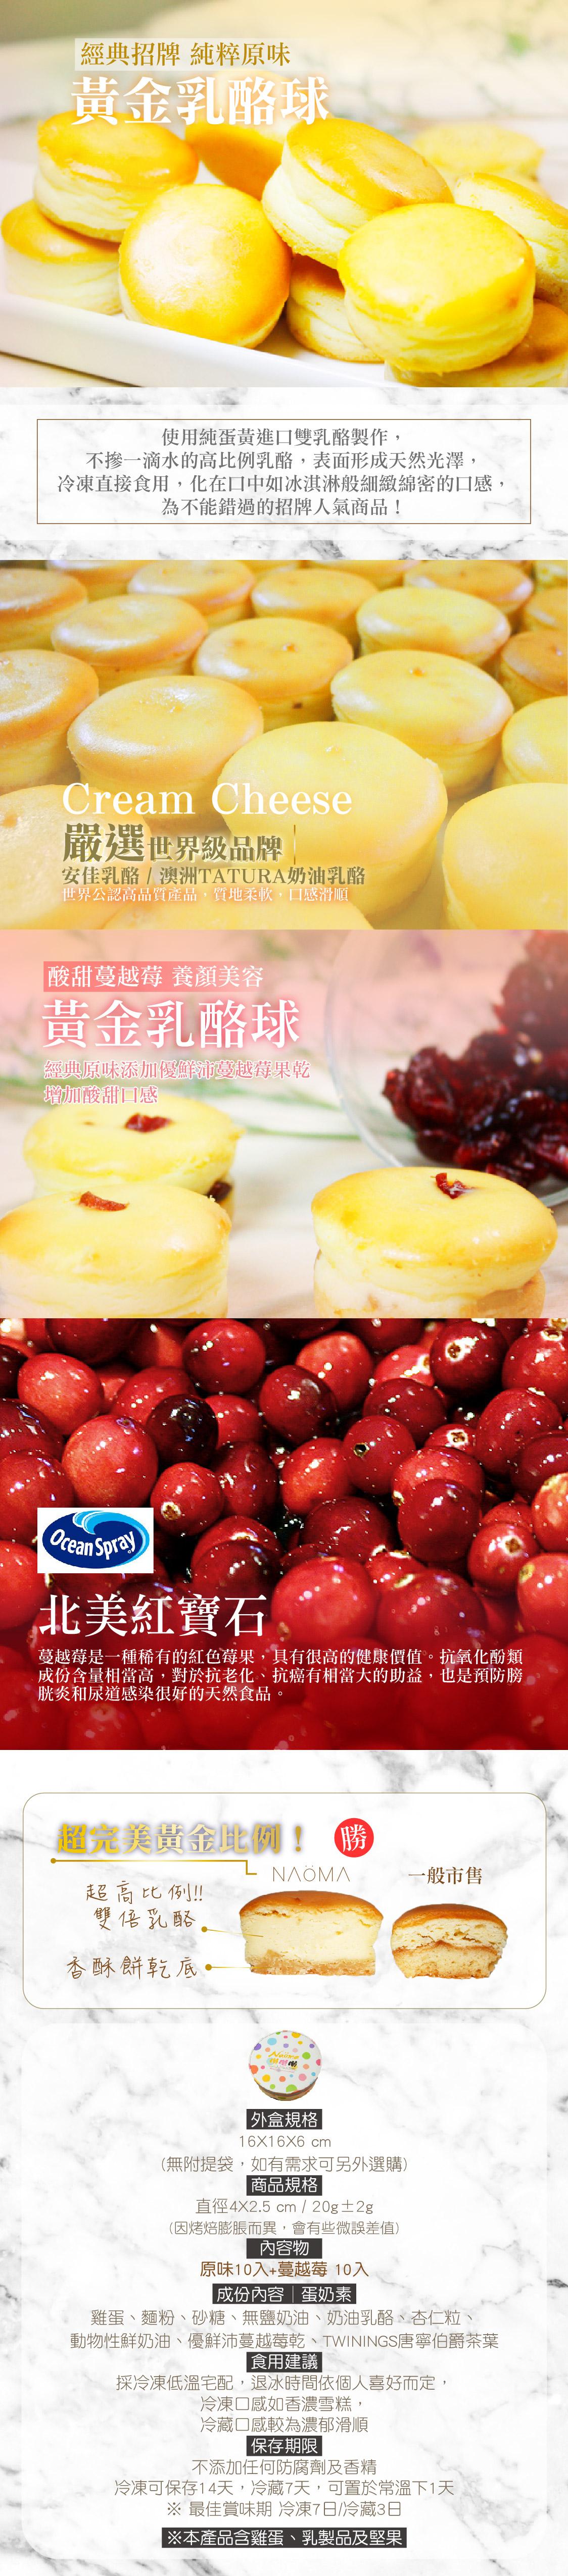 NAOMA黃金乳酪球-原味+蔓越莓